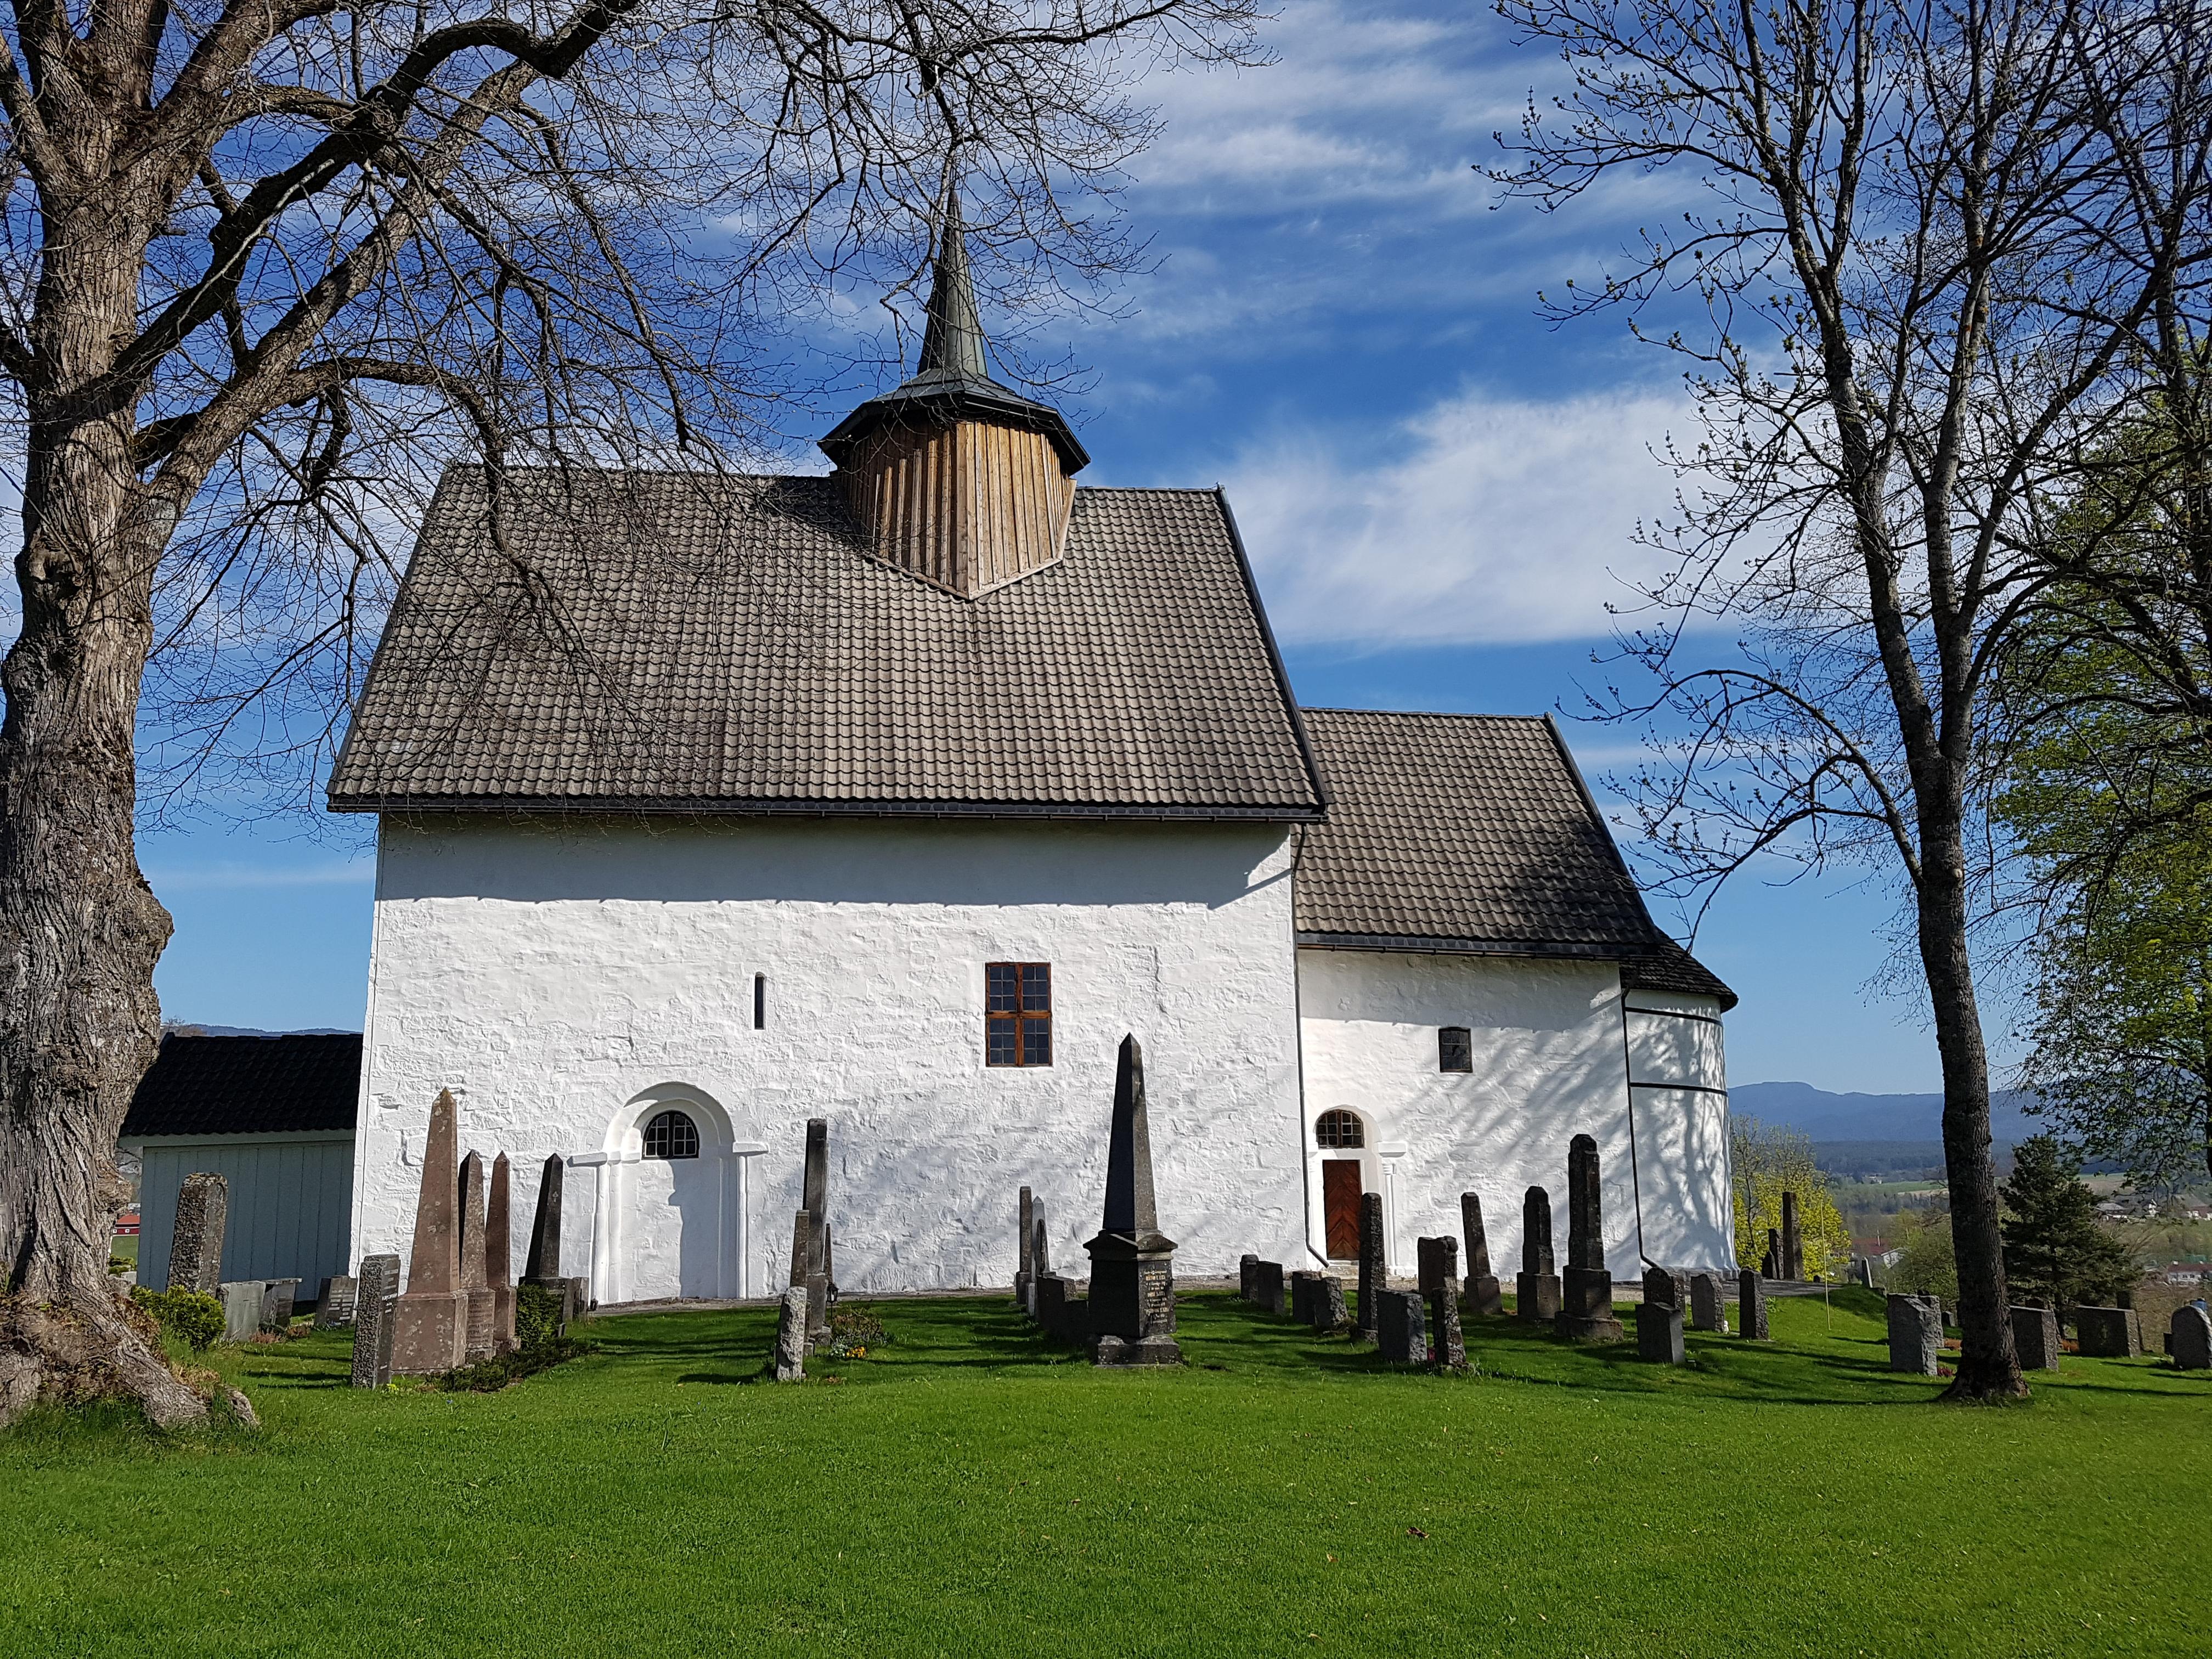 Bø gamle kyrkje